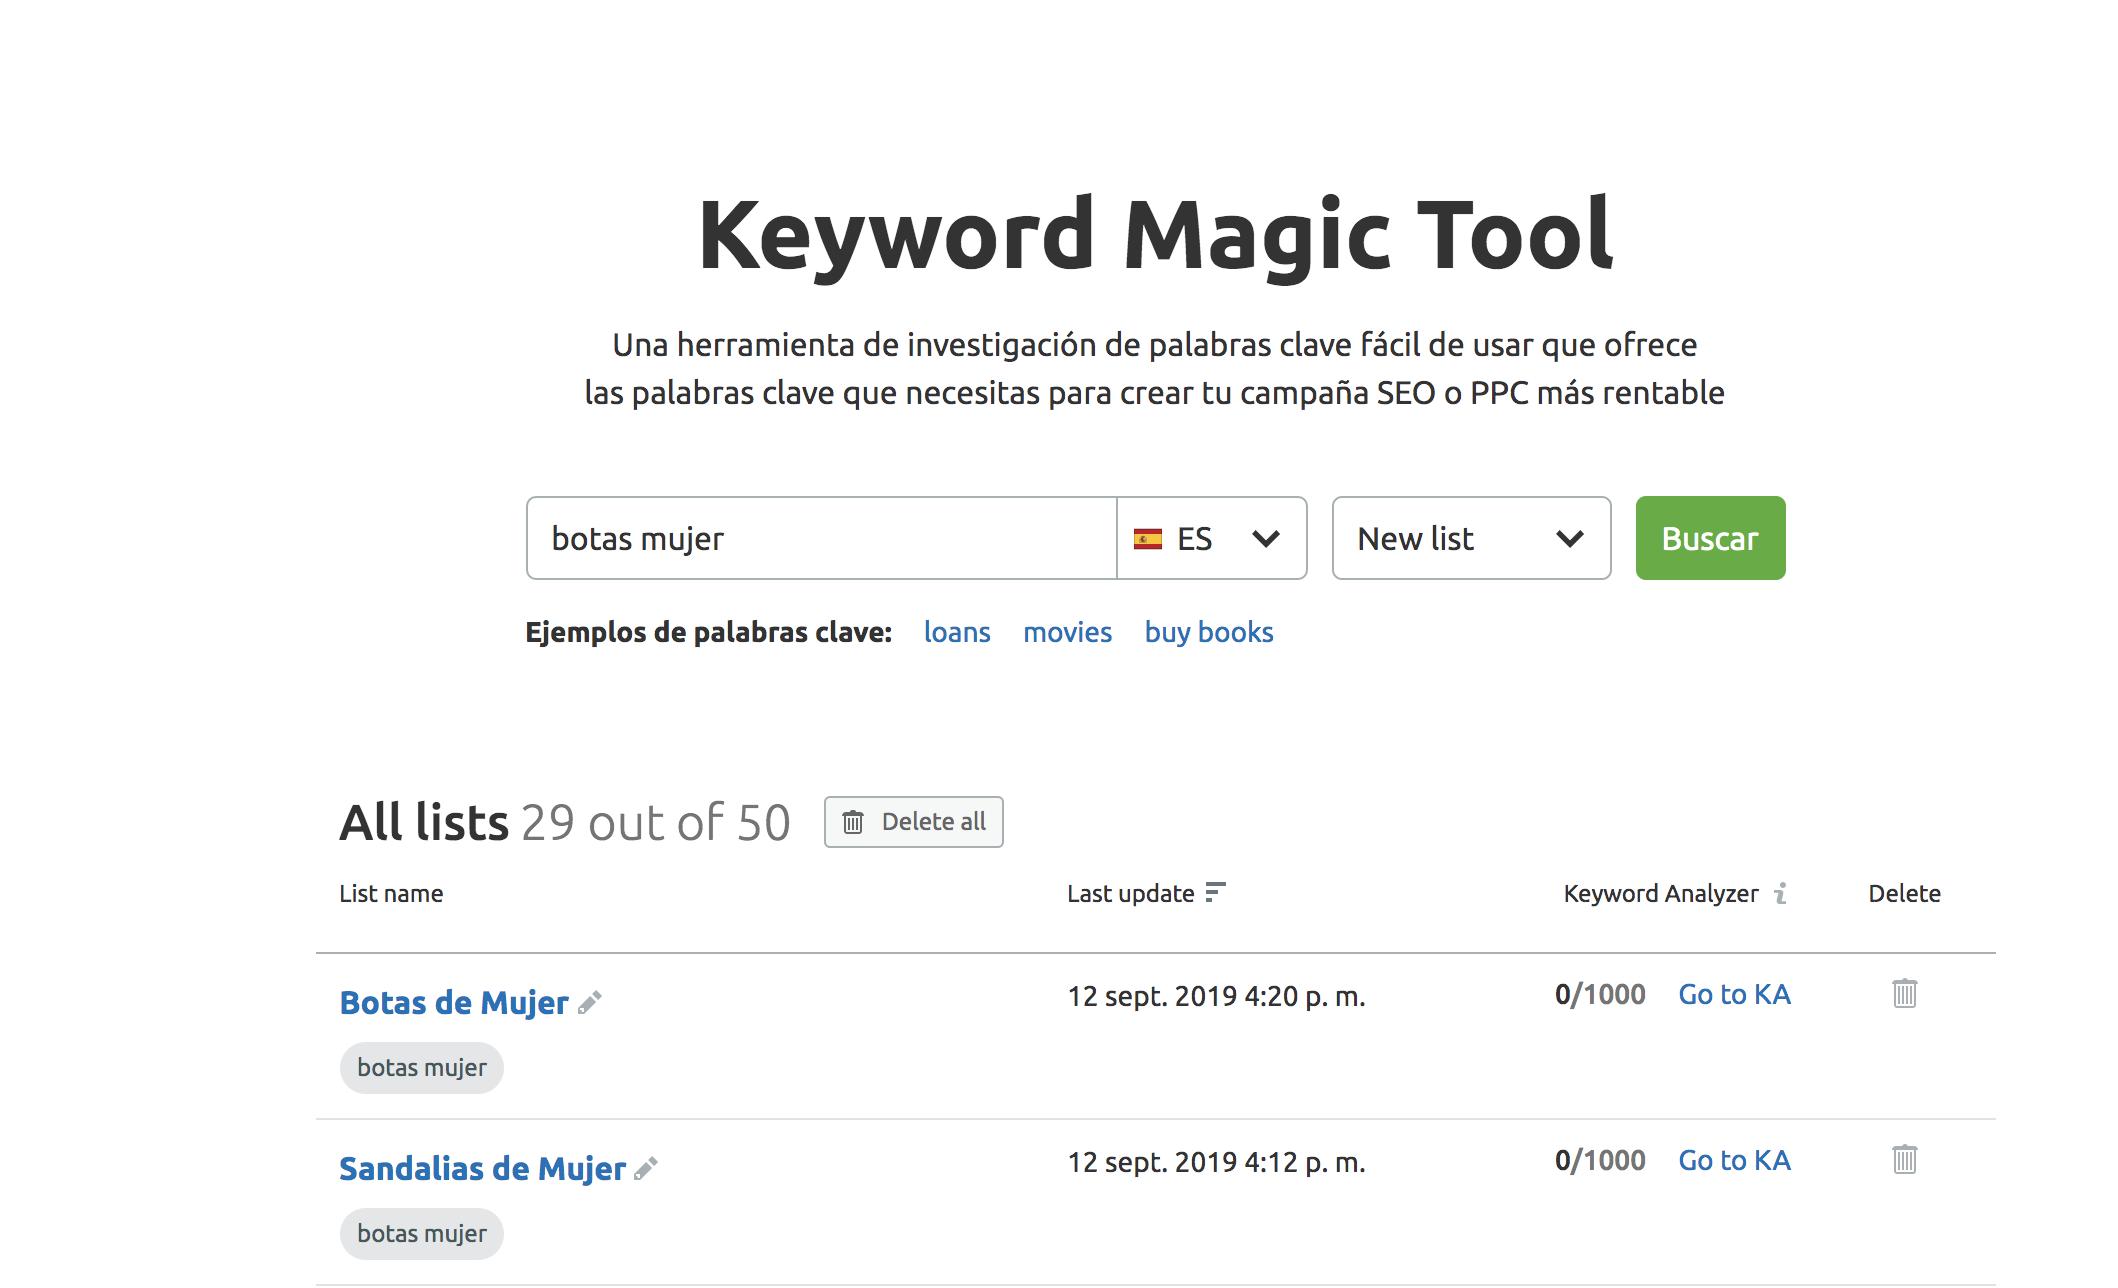 Análisis de keywords - Keyword magic tool listas